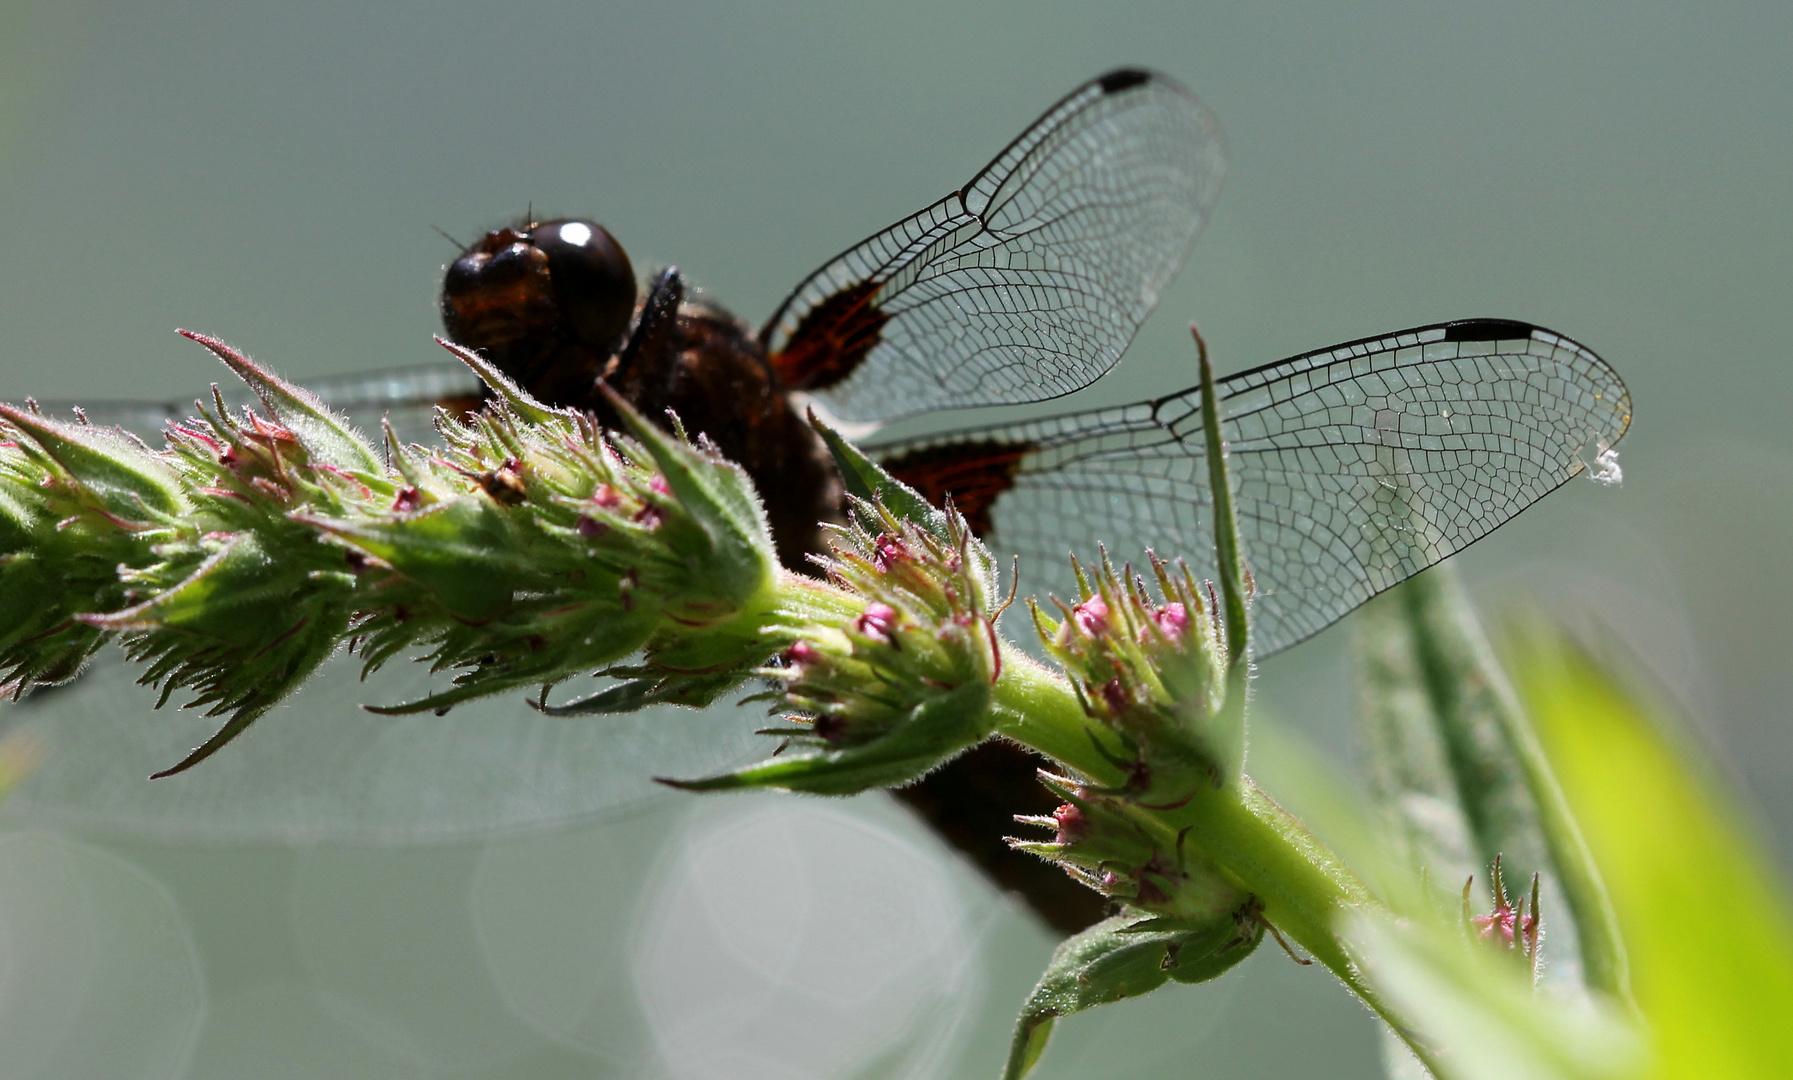 Plattbauch-Libellenmännchen (Libellula depressa)